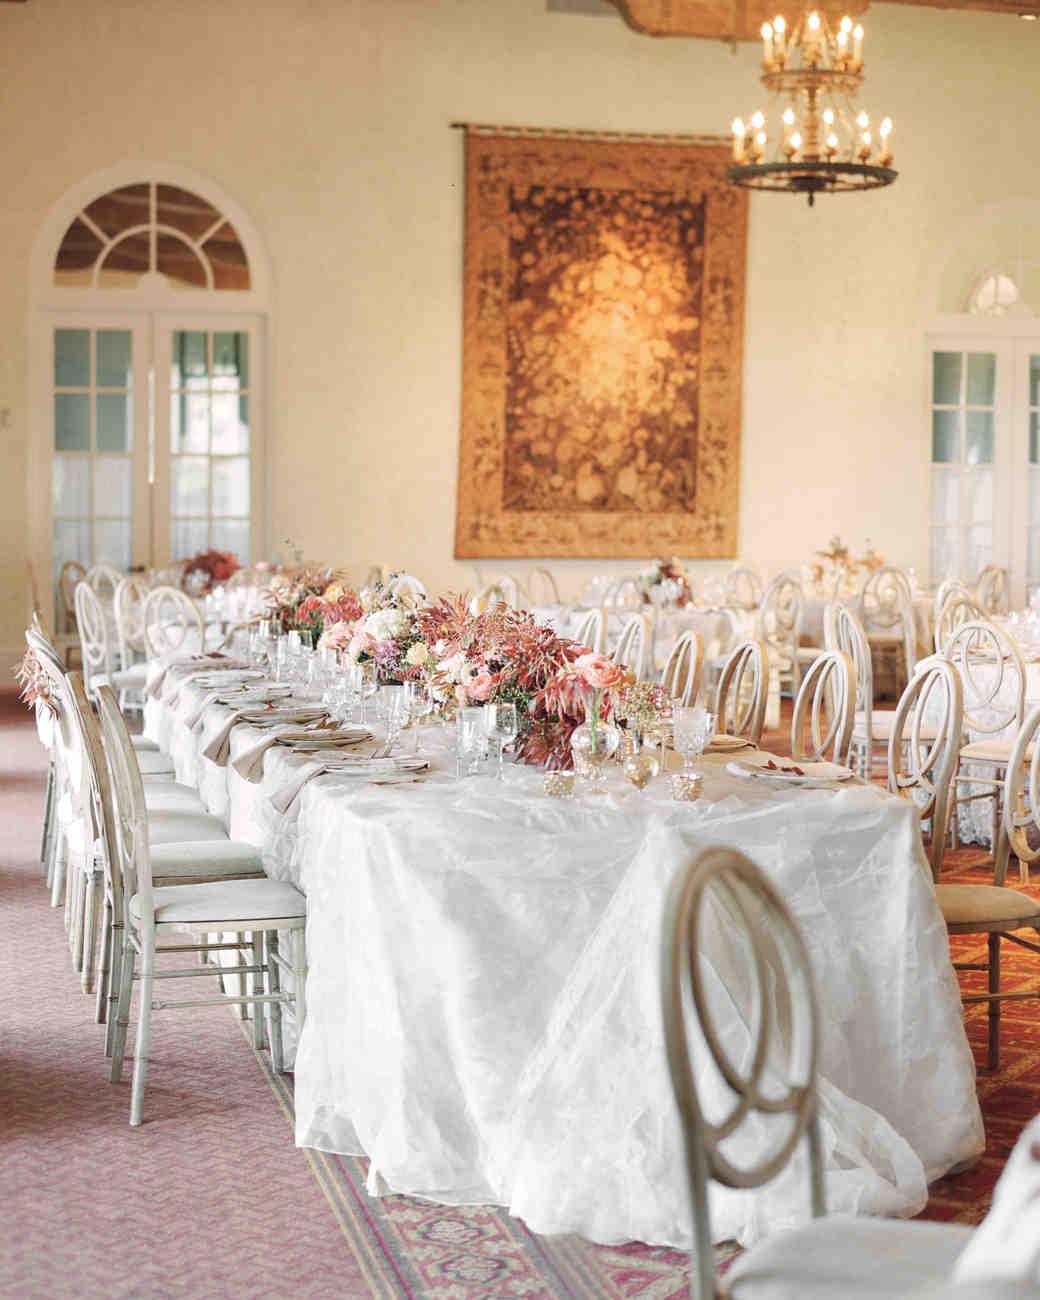 reception-dinner-table-elizabeth-messina-138-mwds110806.jpg